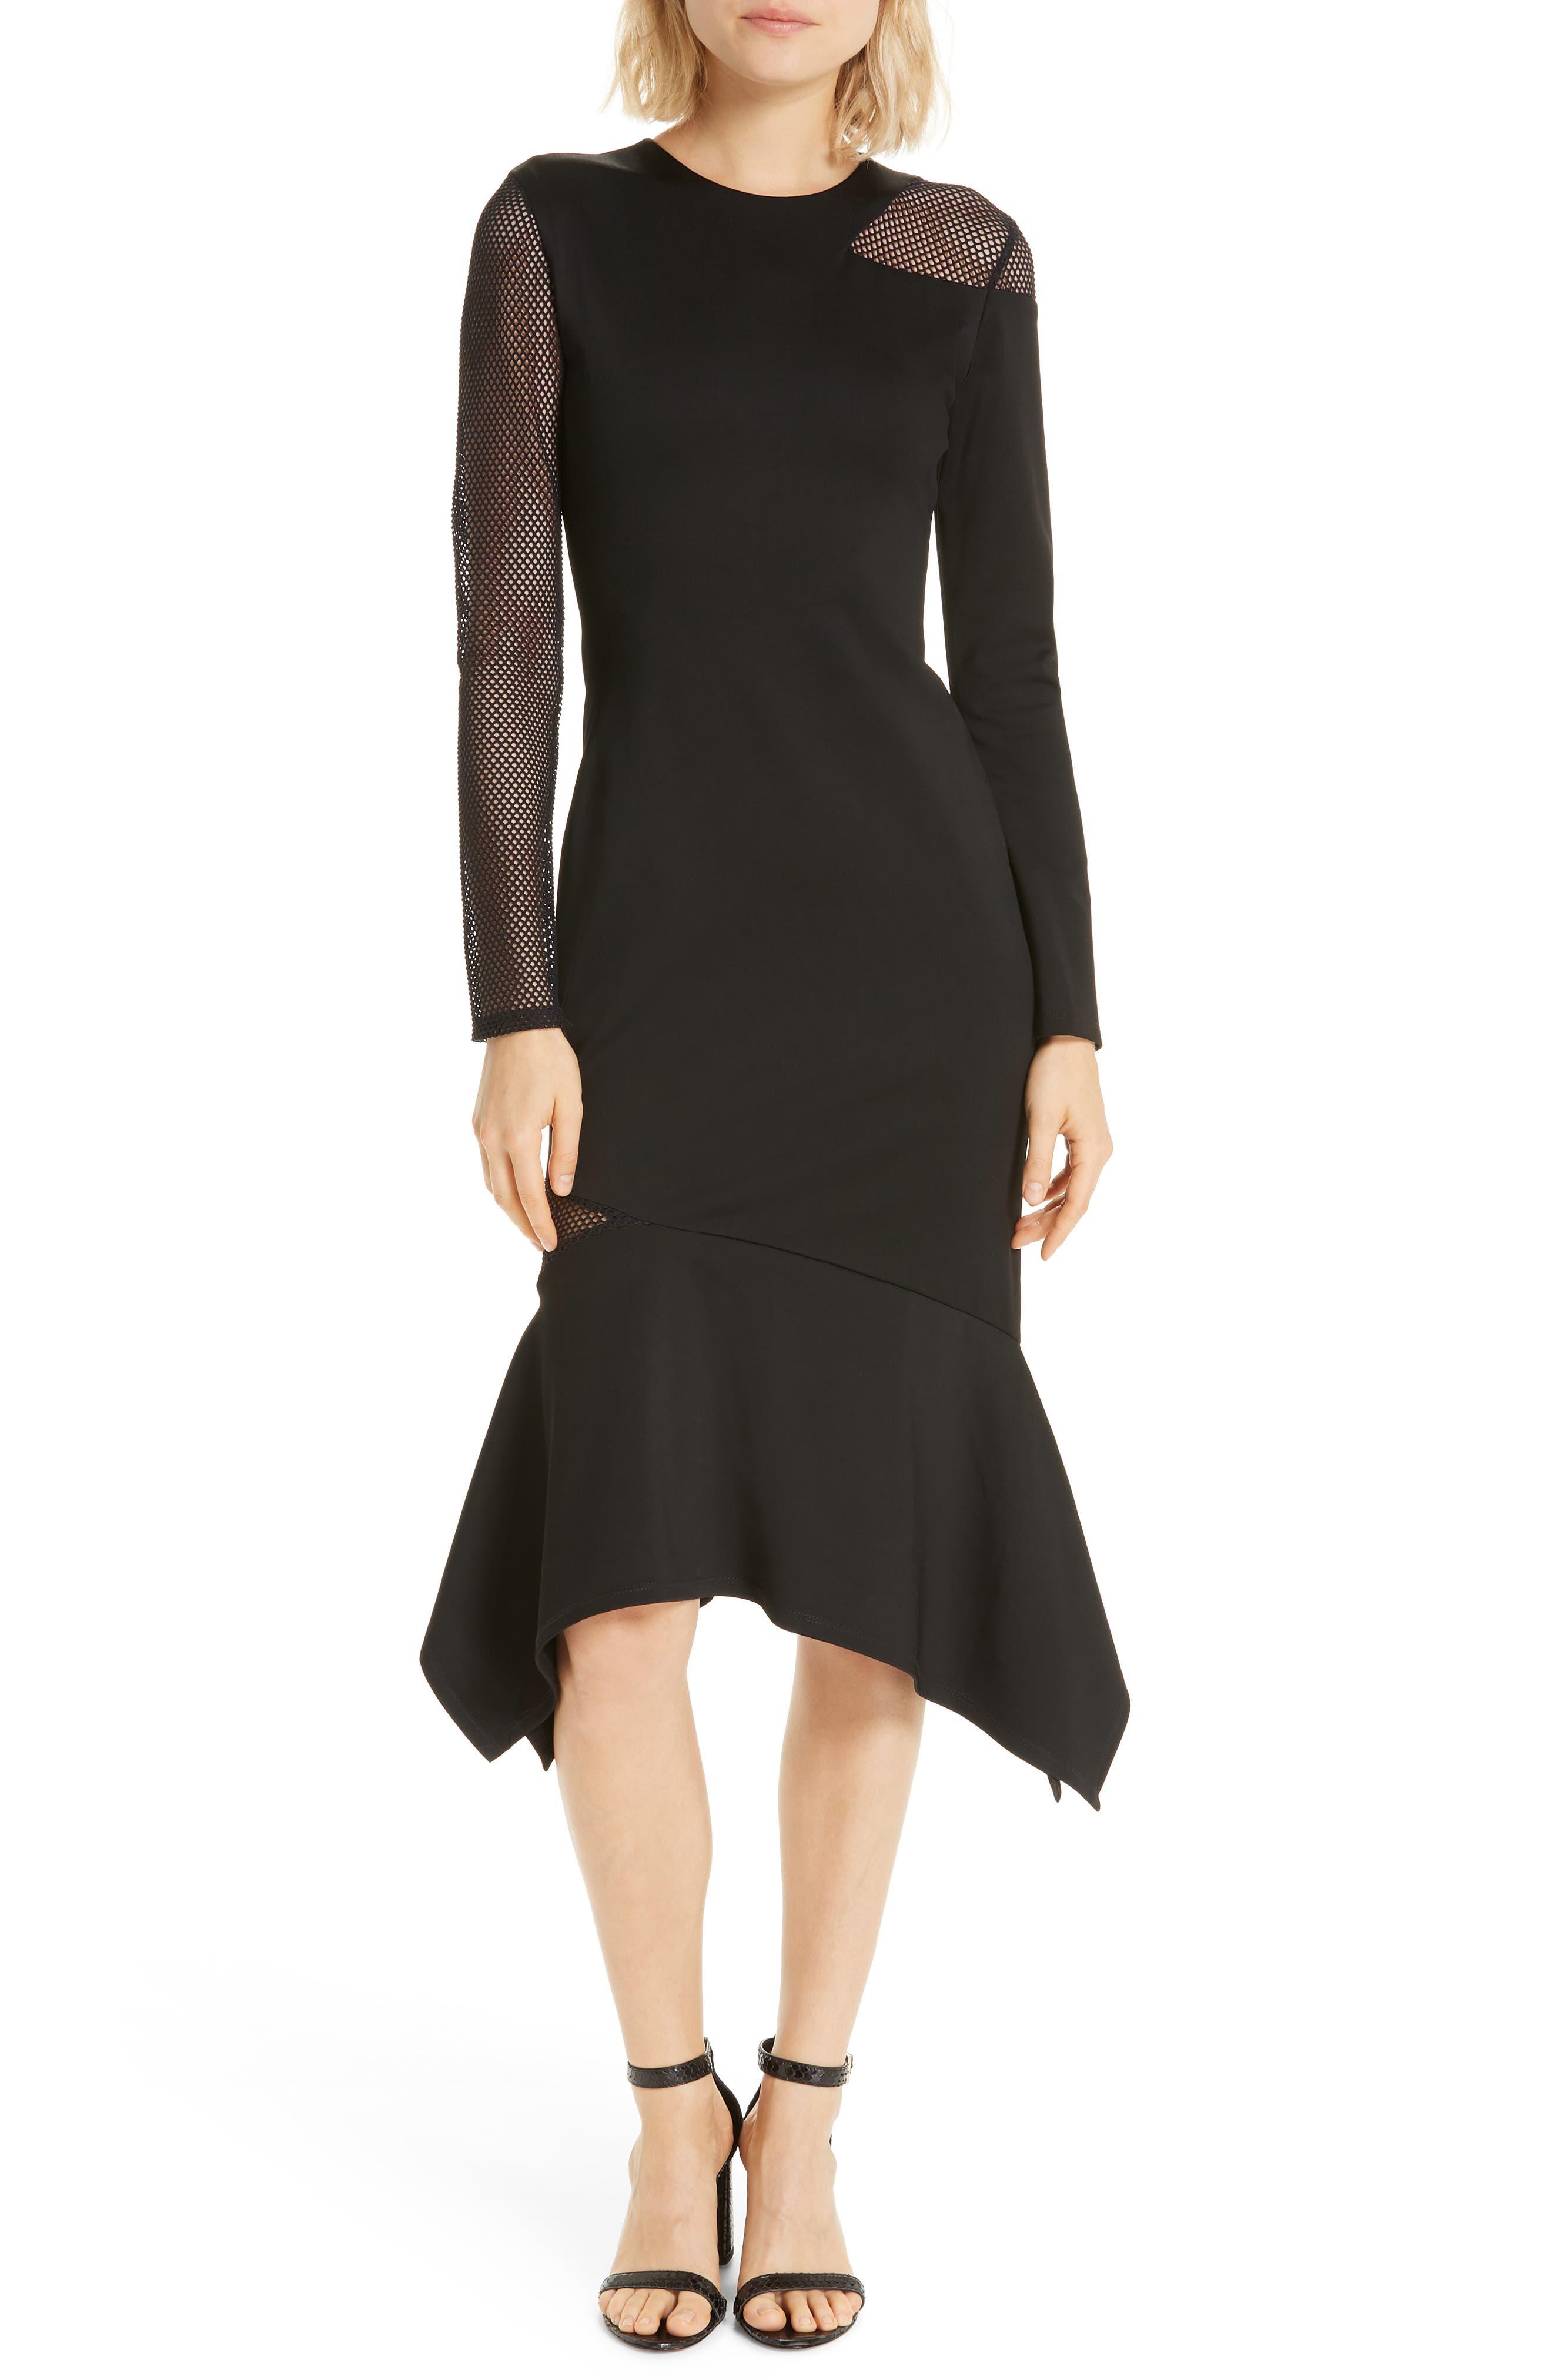 Alice + Olivia Kaine Mesh Inset Asymmetrical Hem Dress, Black